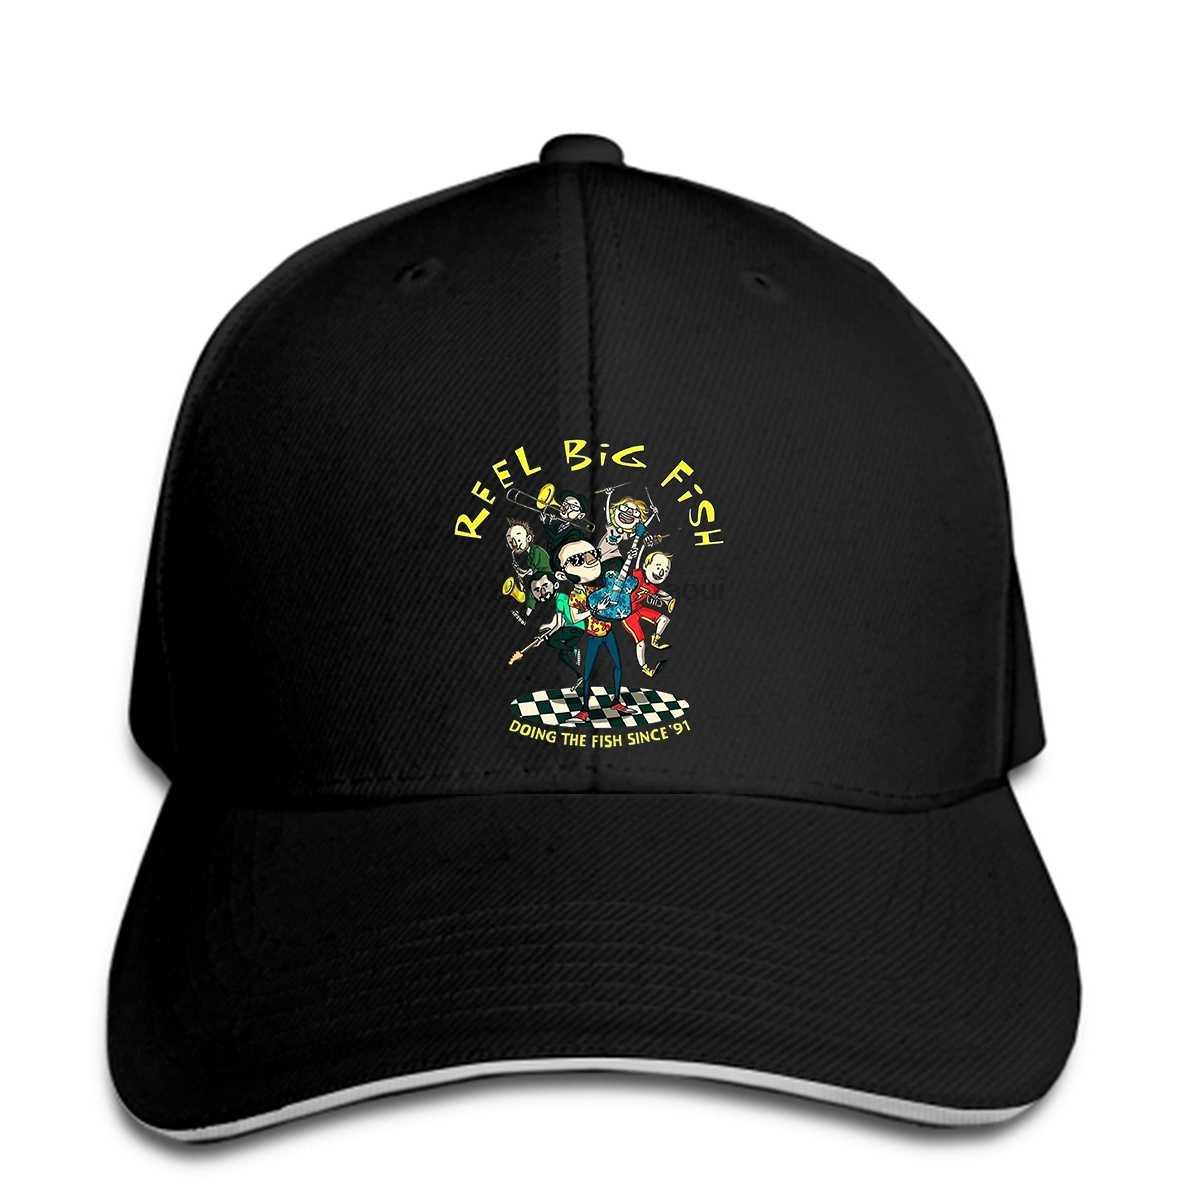 Baseball cap REEL BIG FISH Band Print hat New Arrival Men& Fashion top